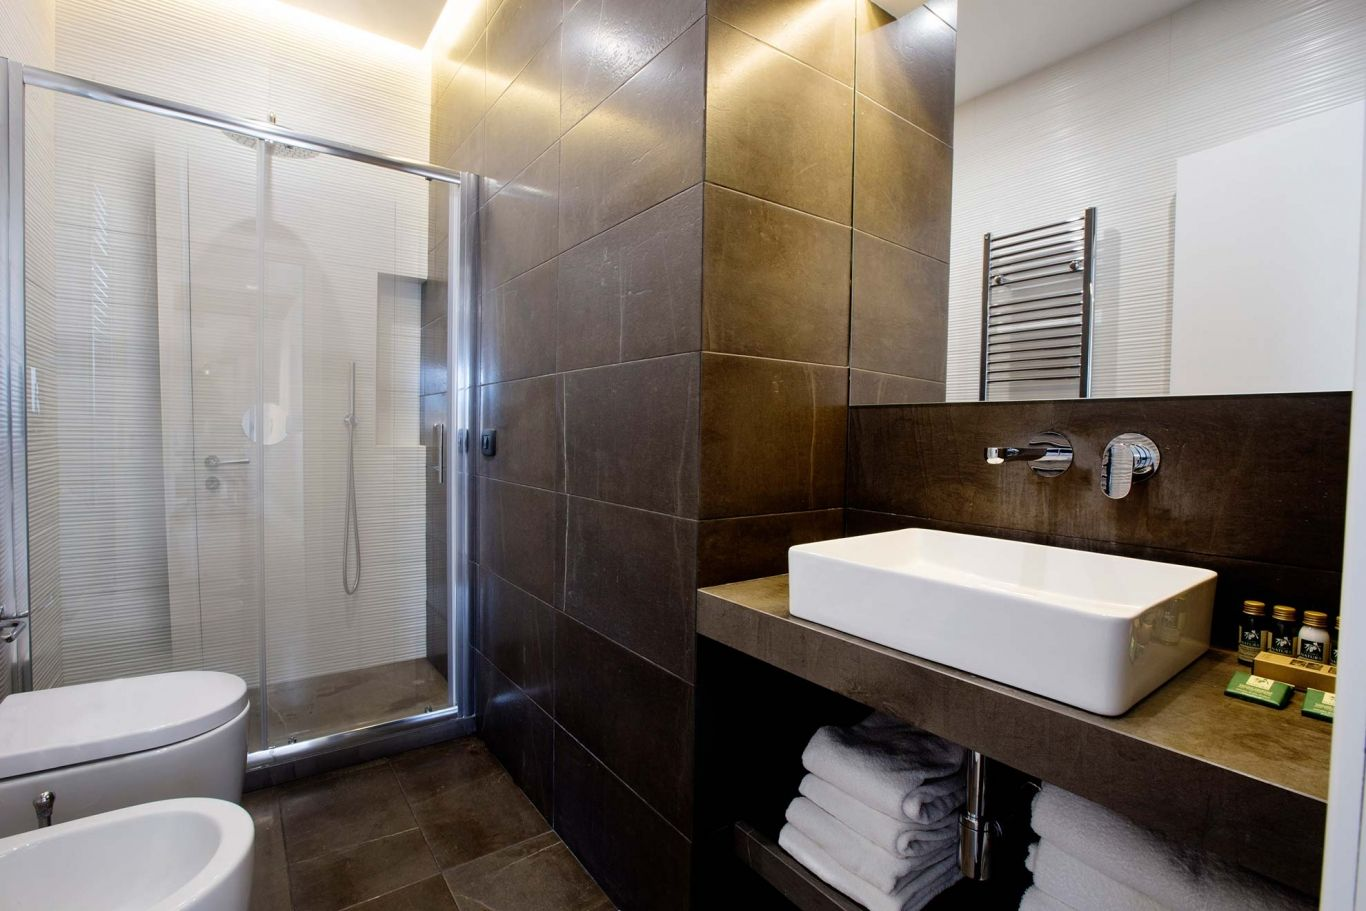 suite-terrazza-mg-9850